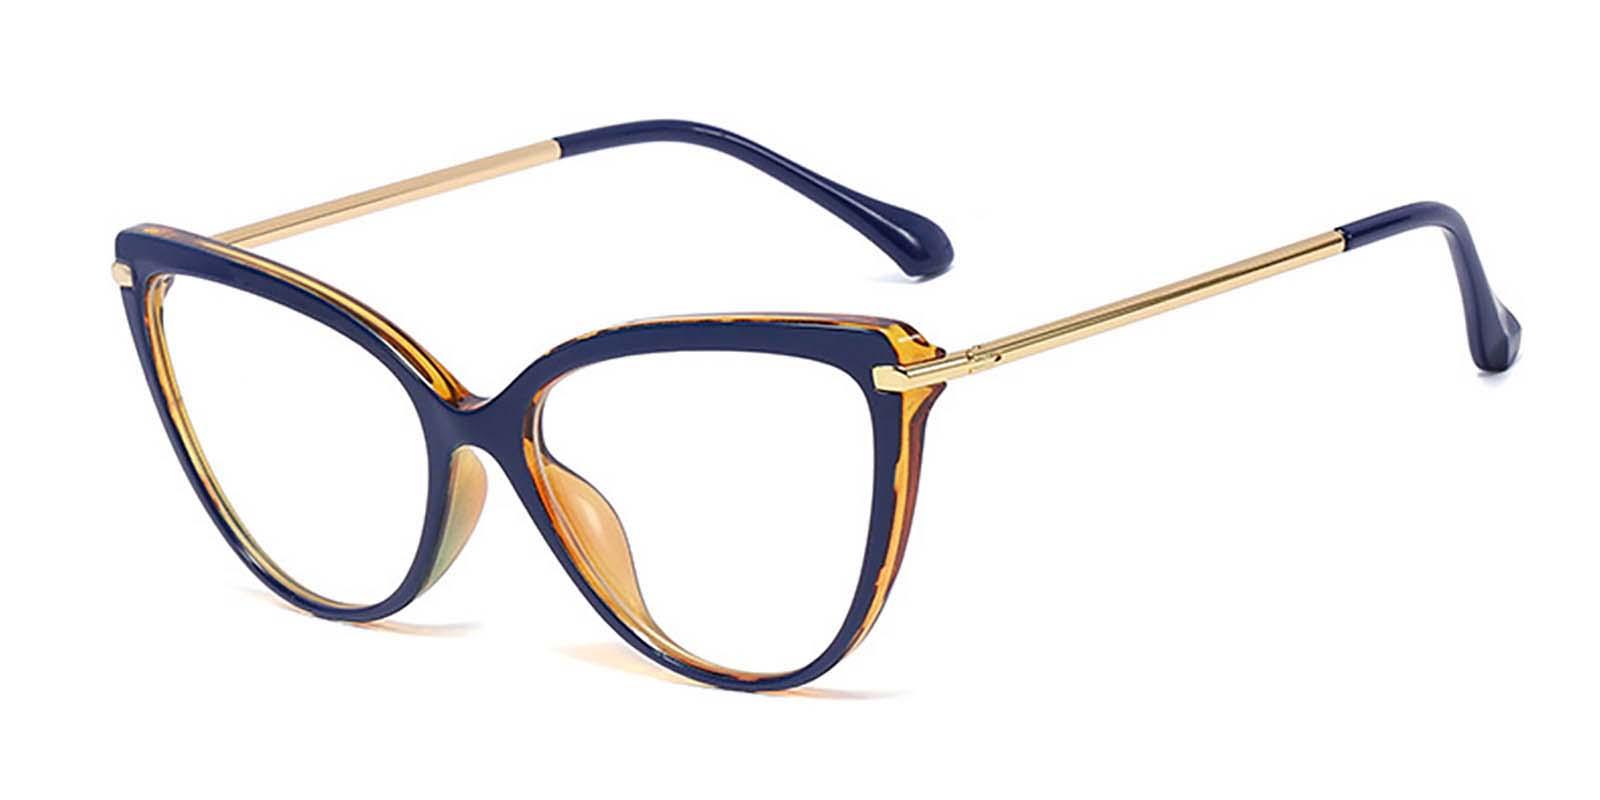 Melisande-Cat eye glasses with Delicate super light metal combo frames